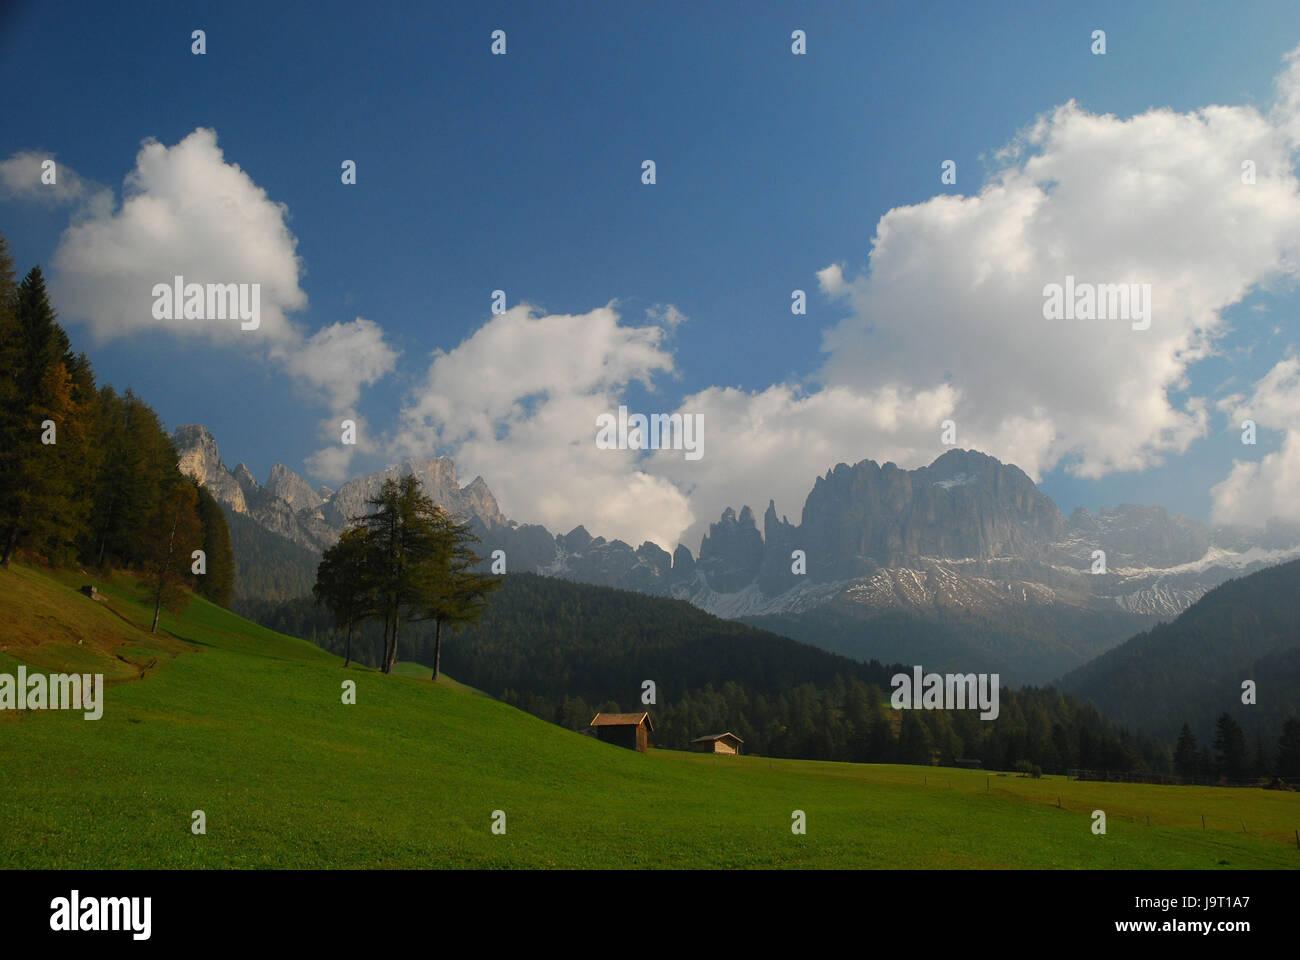 Italy,South Tirol,Tierser valley,St. Zyprian,the Dolomites,mountain pasture,rose garden,Vajolettürme,pert electrolytic - Stock Image